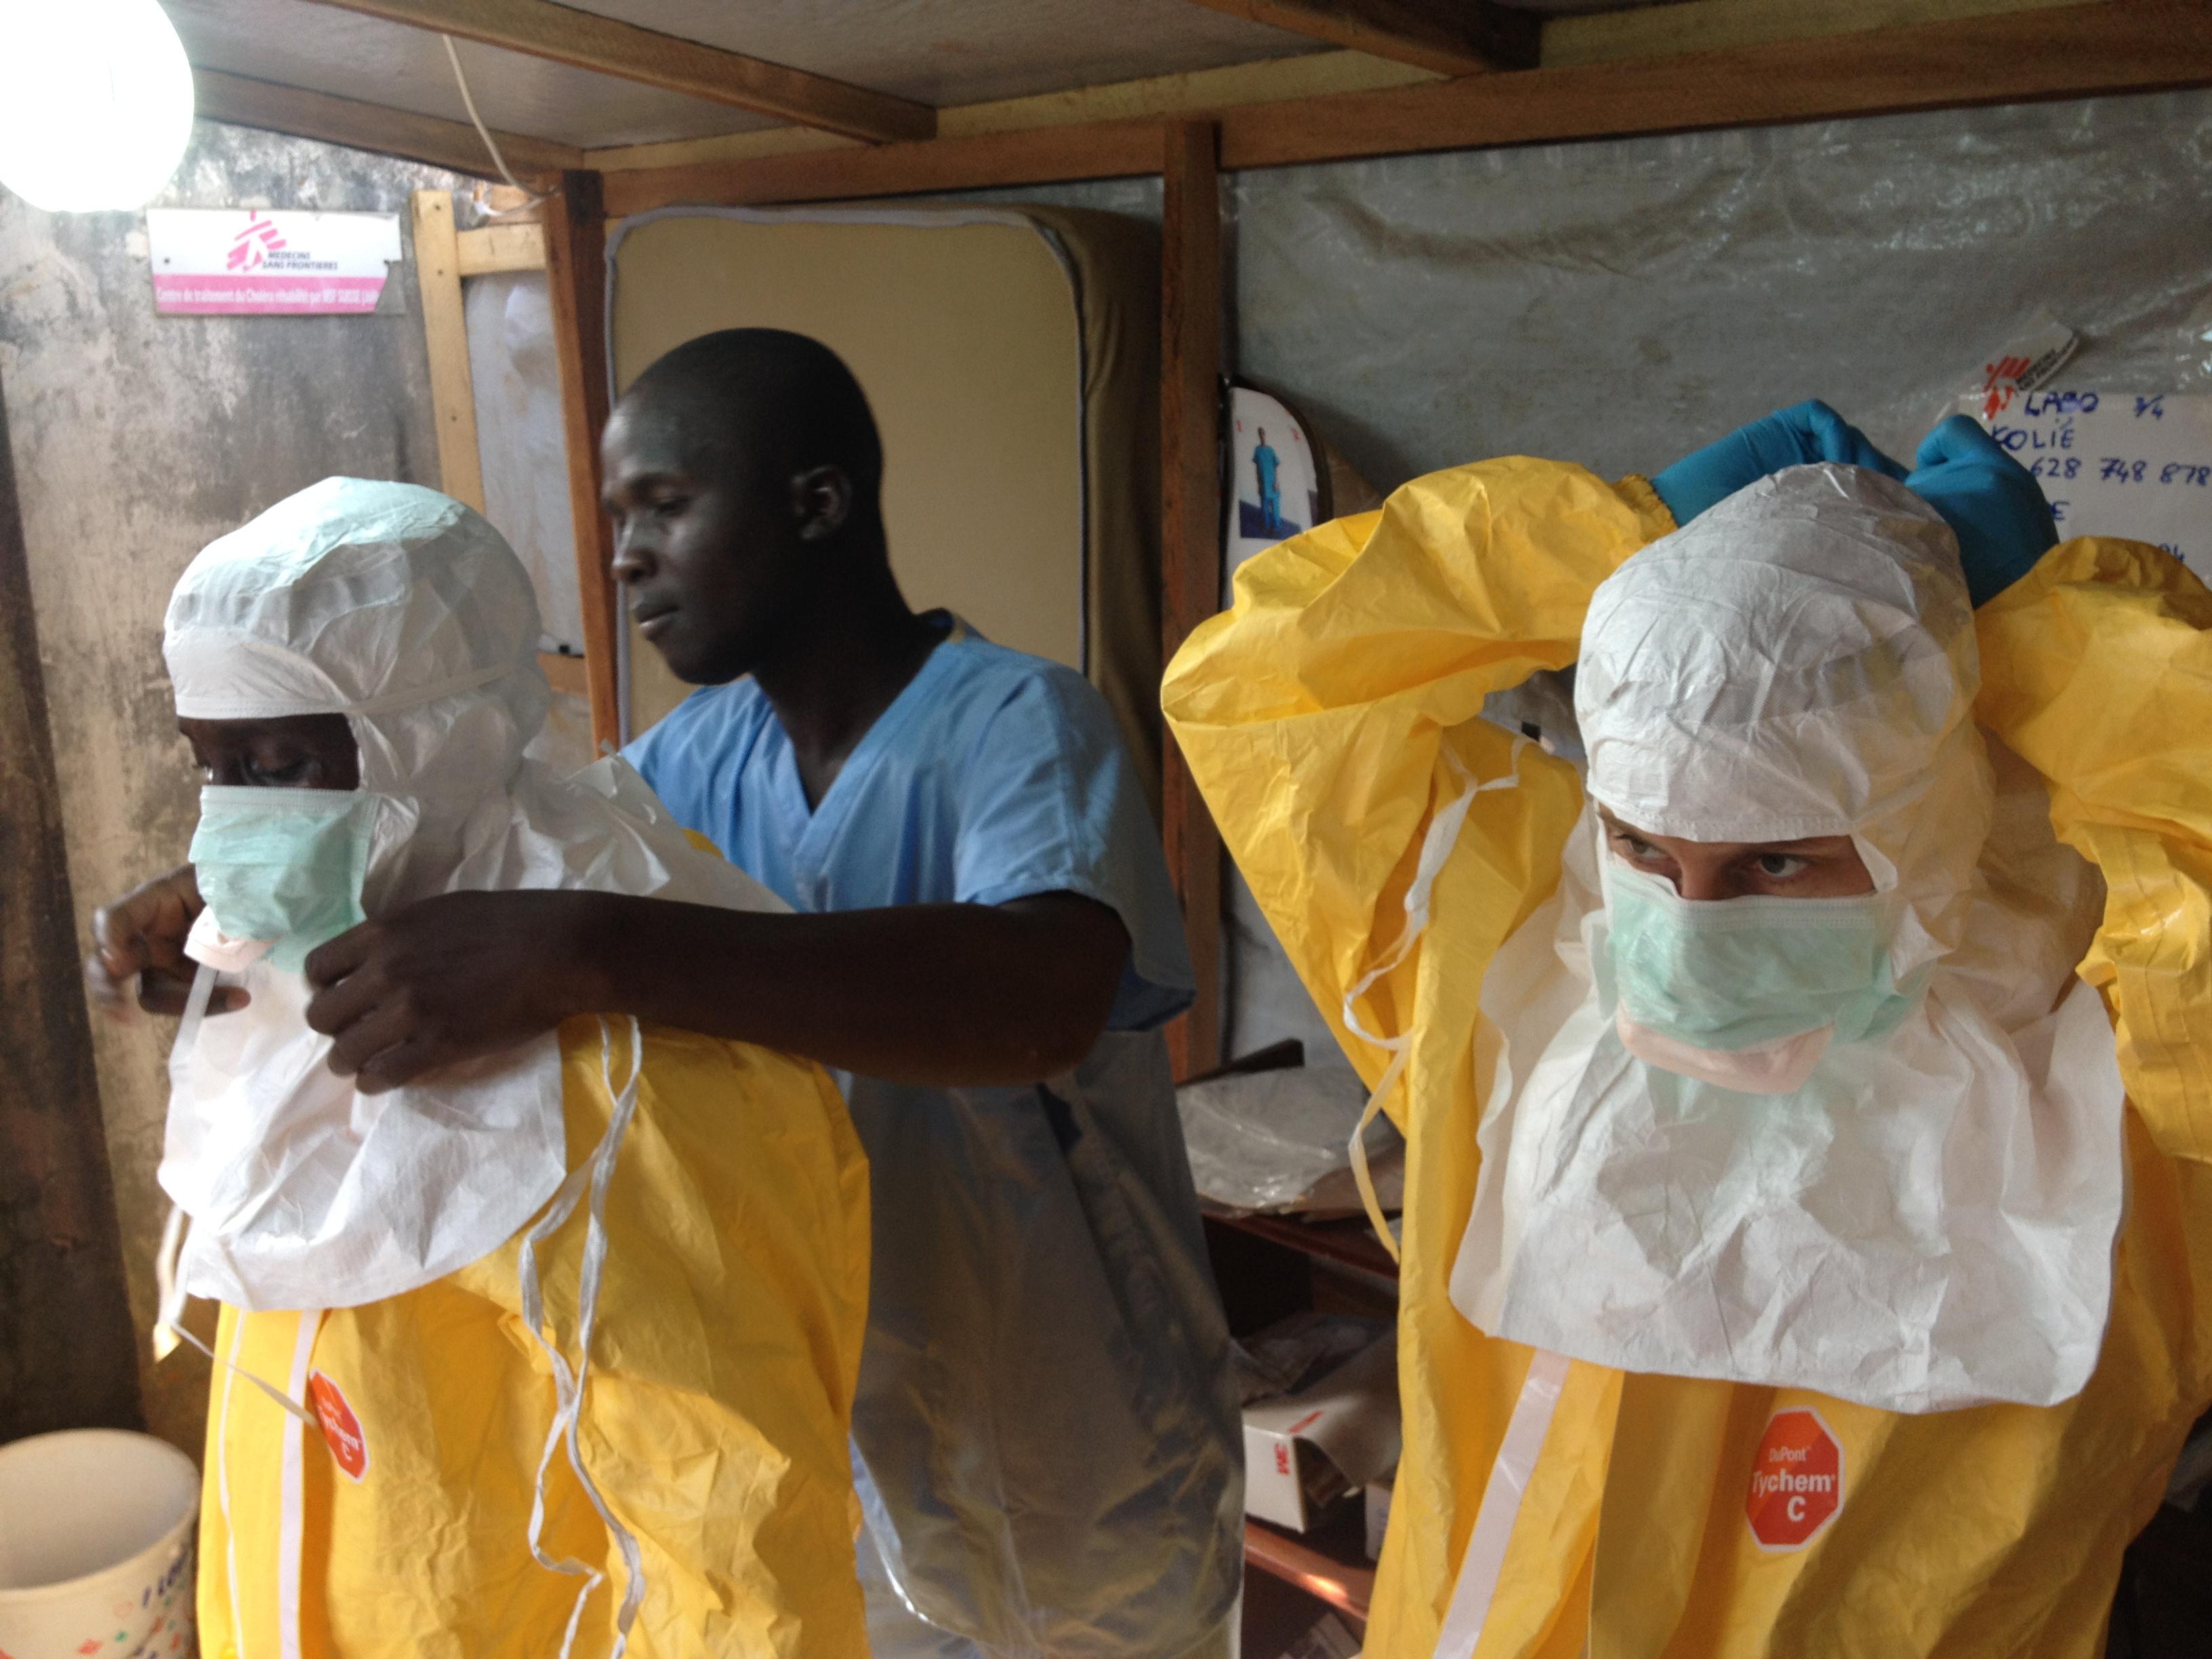 La epidemia de Ébola continúa propagándose por África Occidental